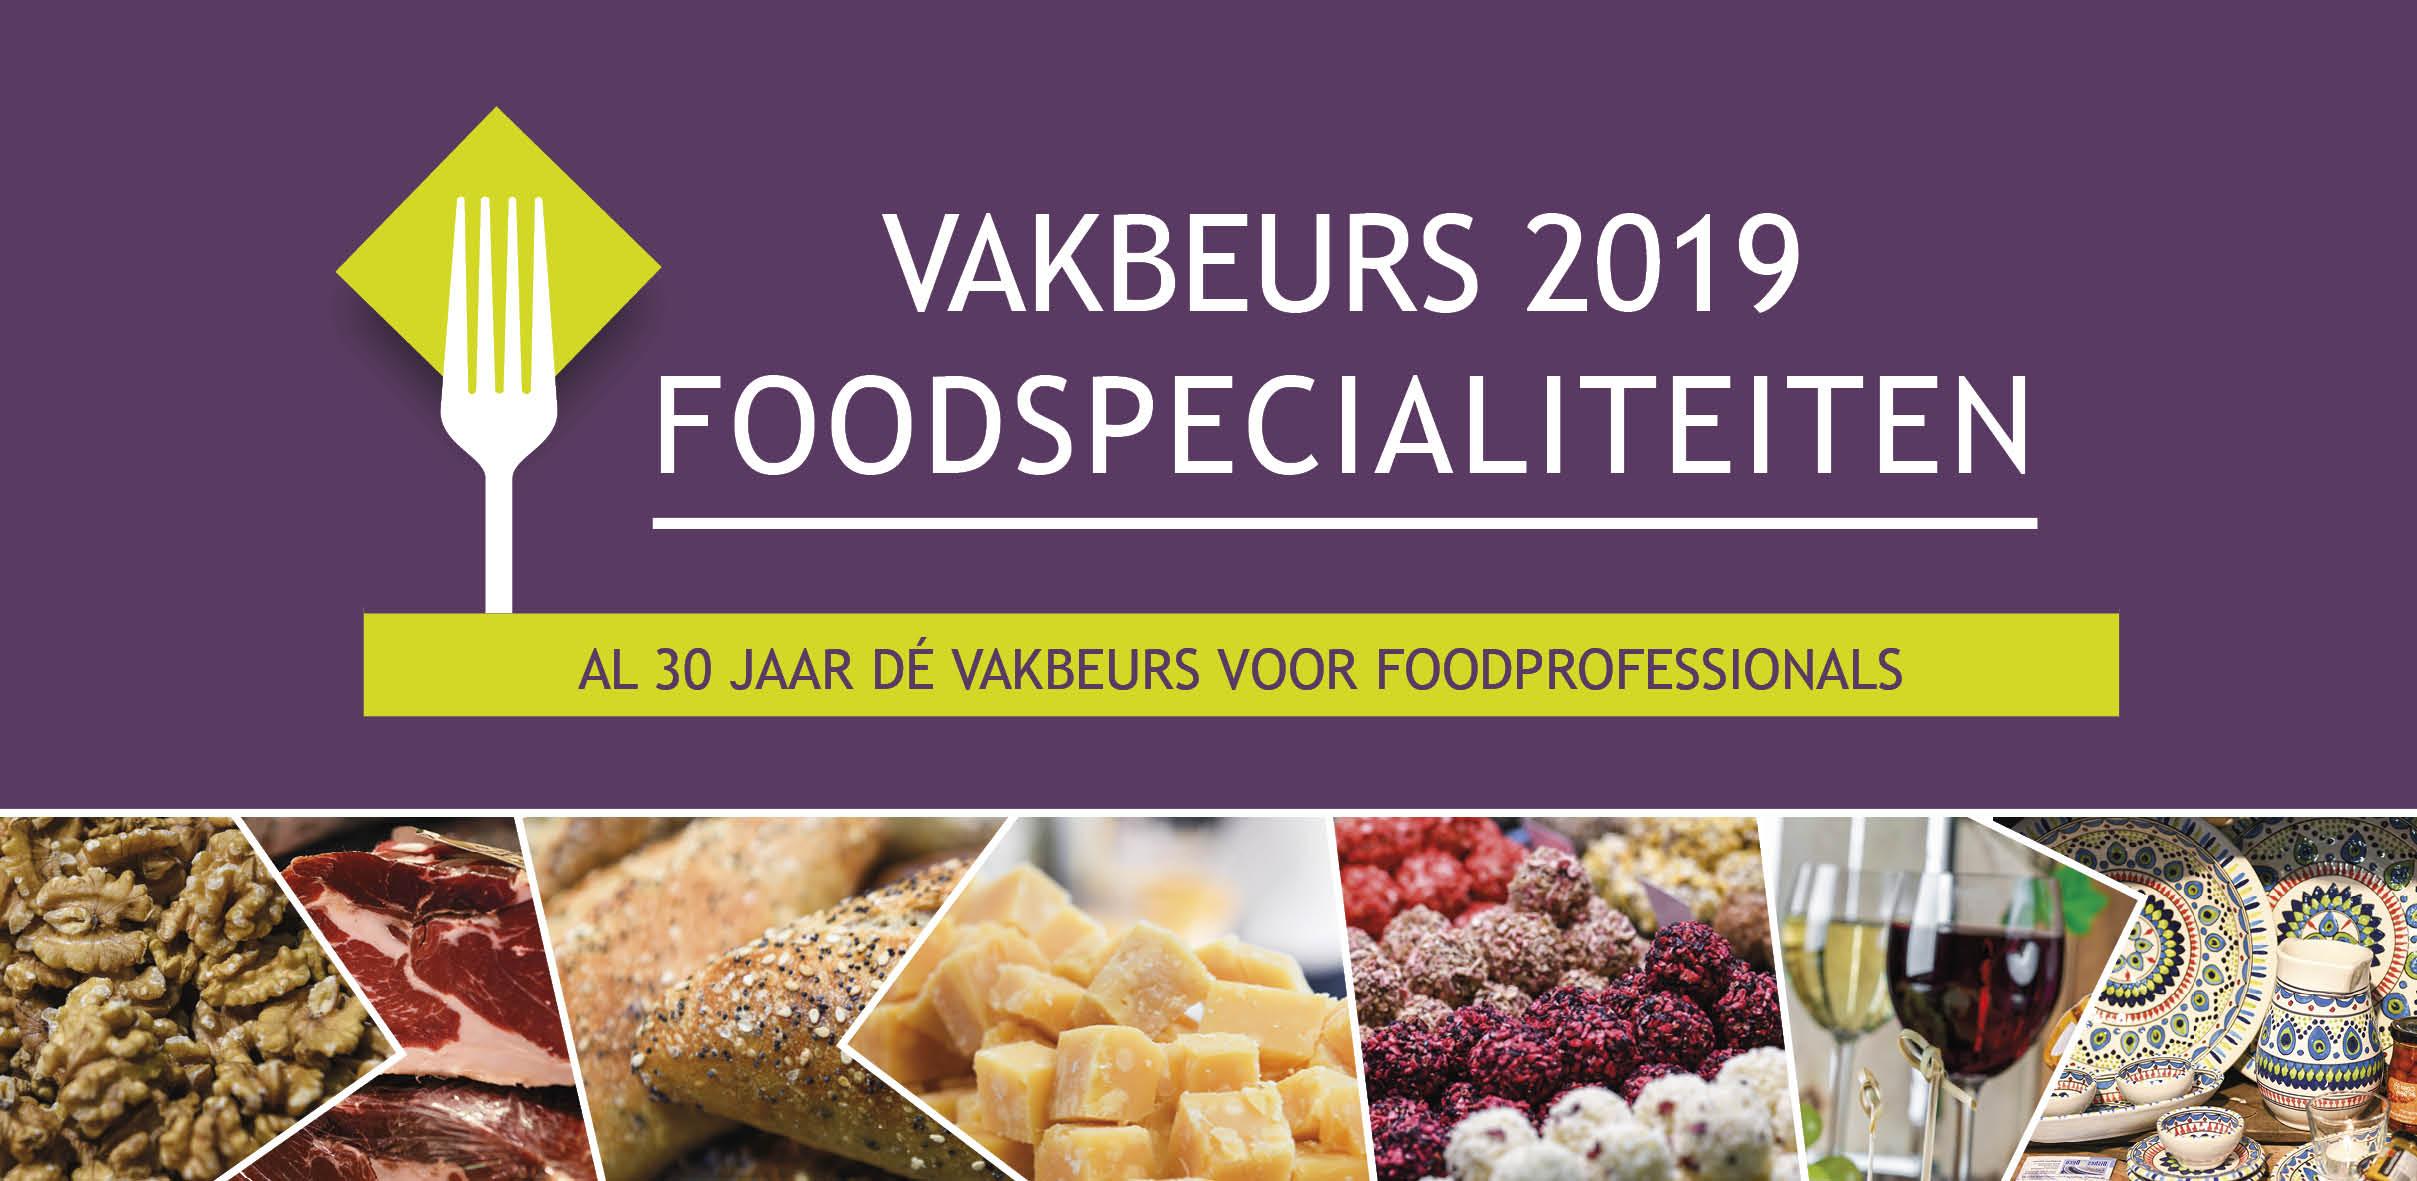 MAAZ Cheese Vakbeurs foodspecialiteiten